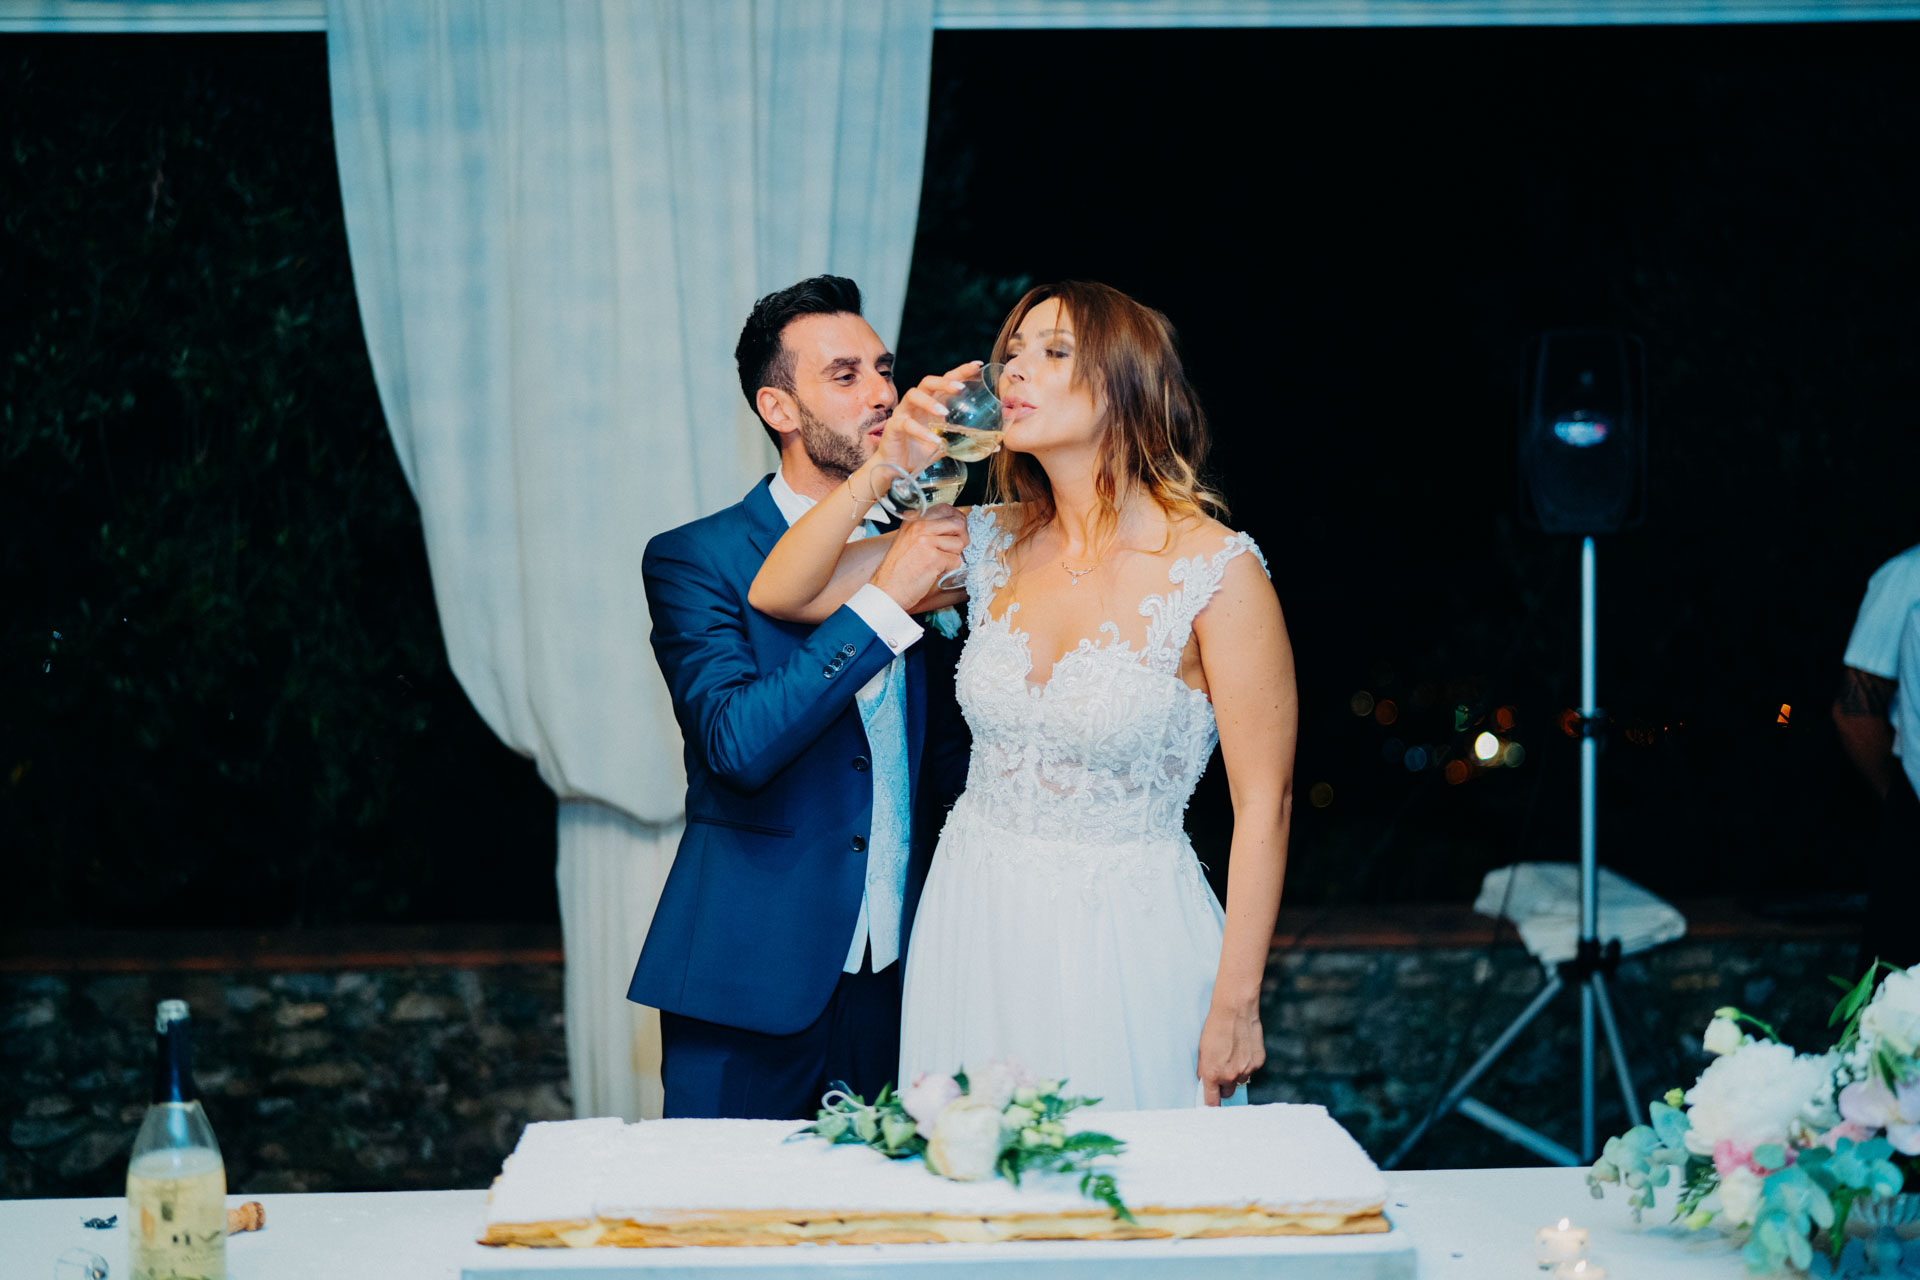 fotografo_matrimonio_toscana_poggio_tondo_113